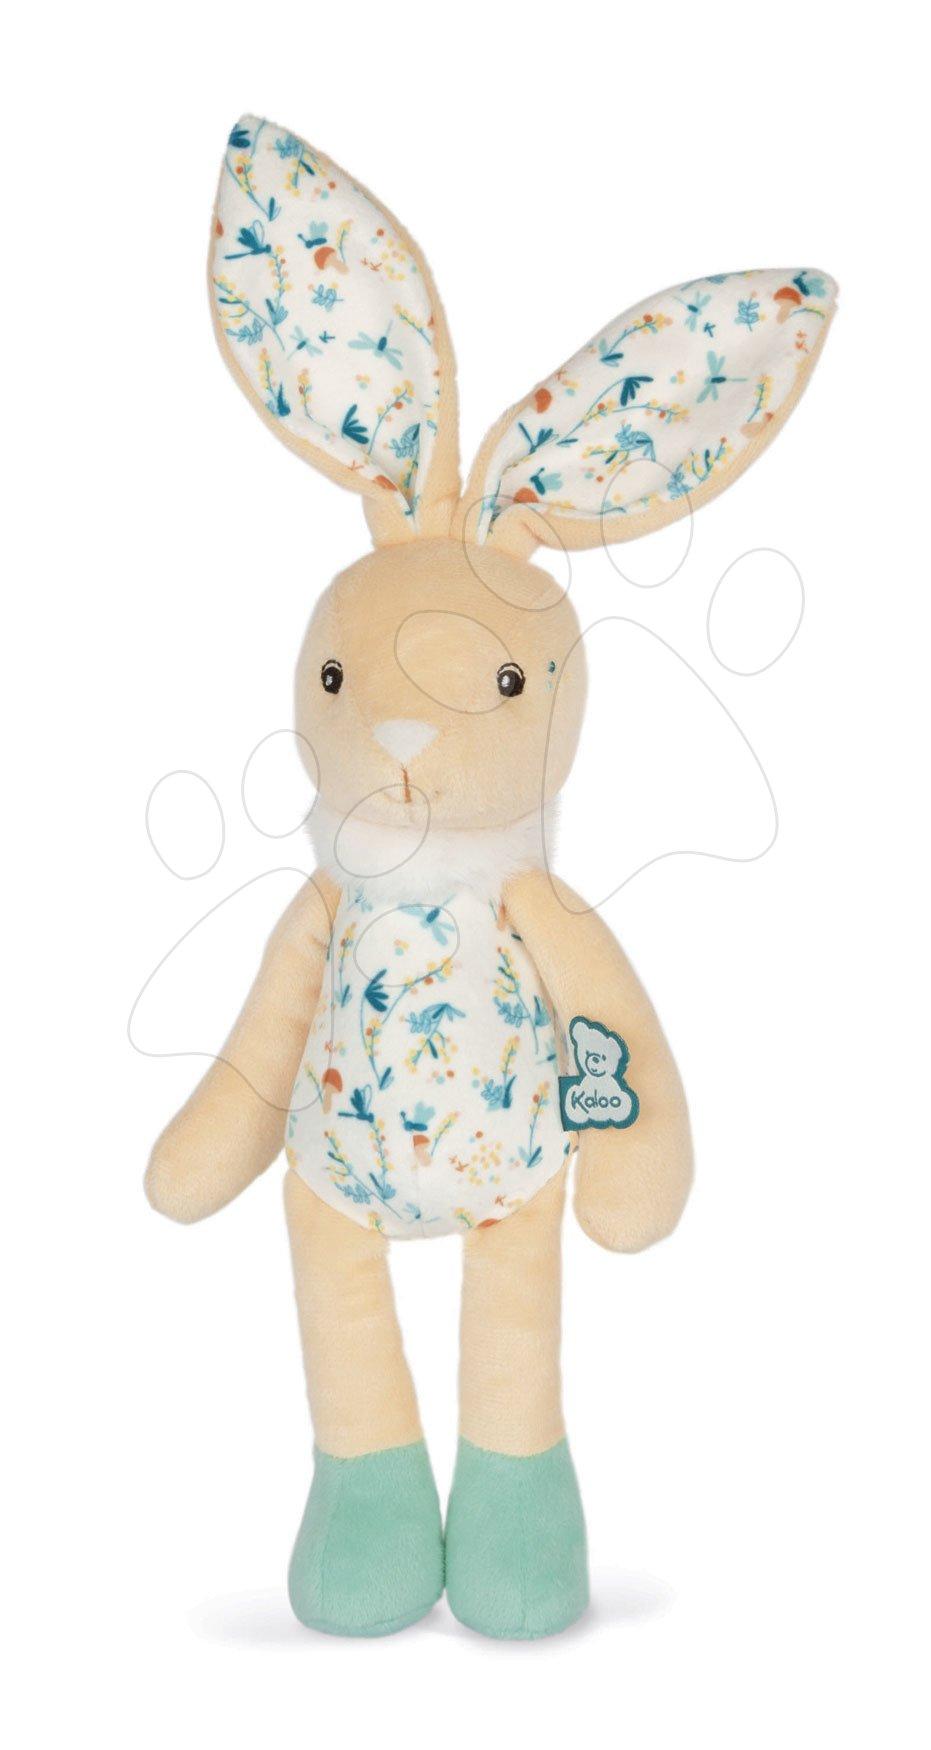 Hračky pro miminka - Bábika plyšový zajac Justin Rabbit Doll Fripons Kaloo z jemného materiálu 25 cm v darčekovom balení od 0 mes K969997